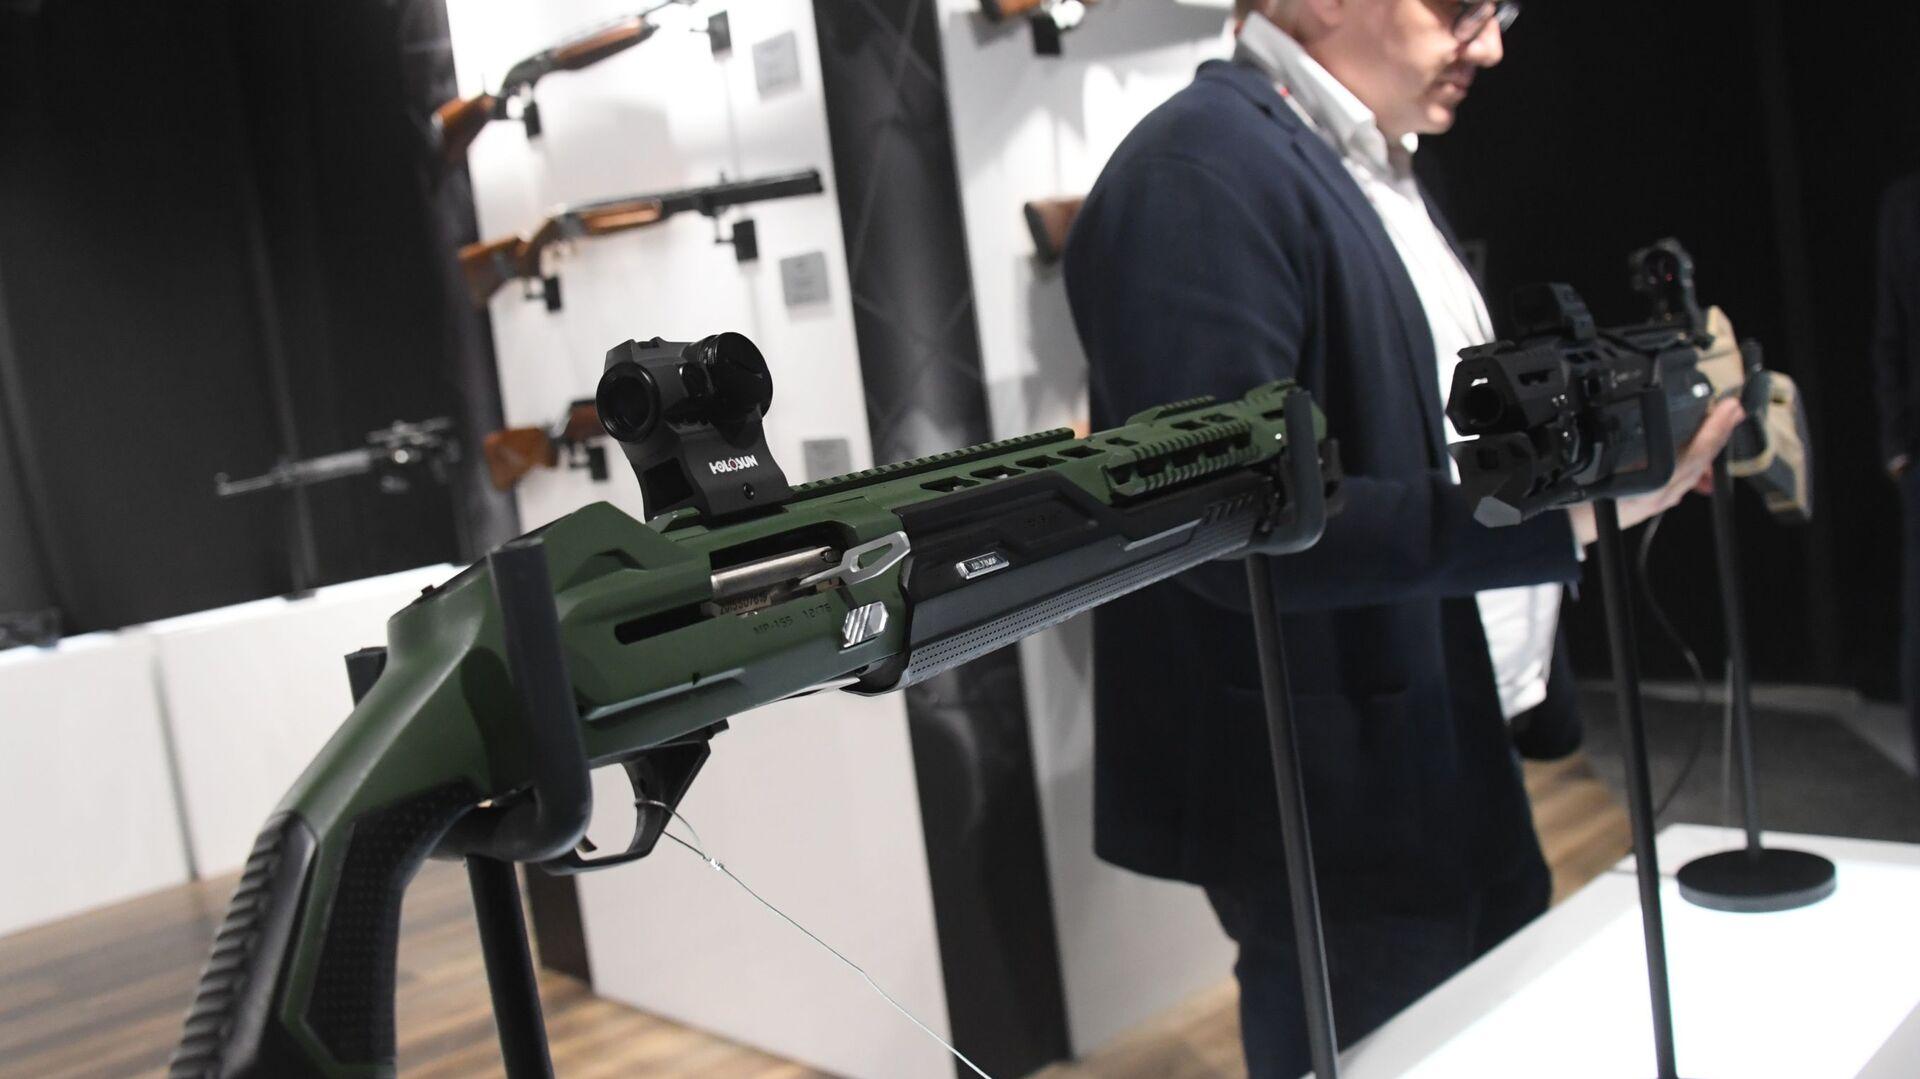 Паметан пиштољ МП-155 Ултима 12, Калашњиков - Sputnik Србија, 1920, 20.09.2021